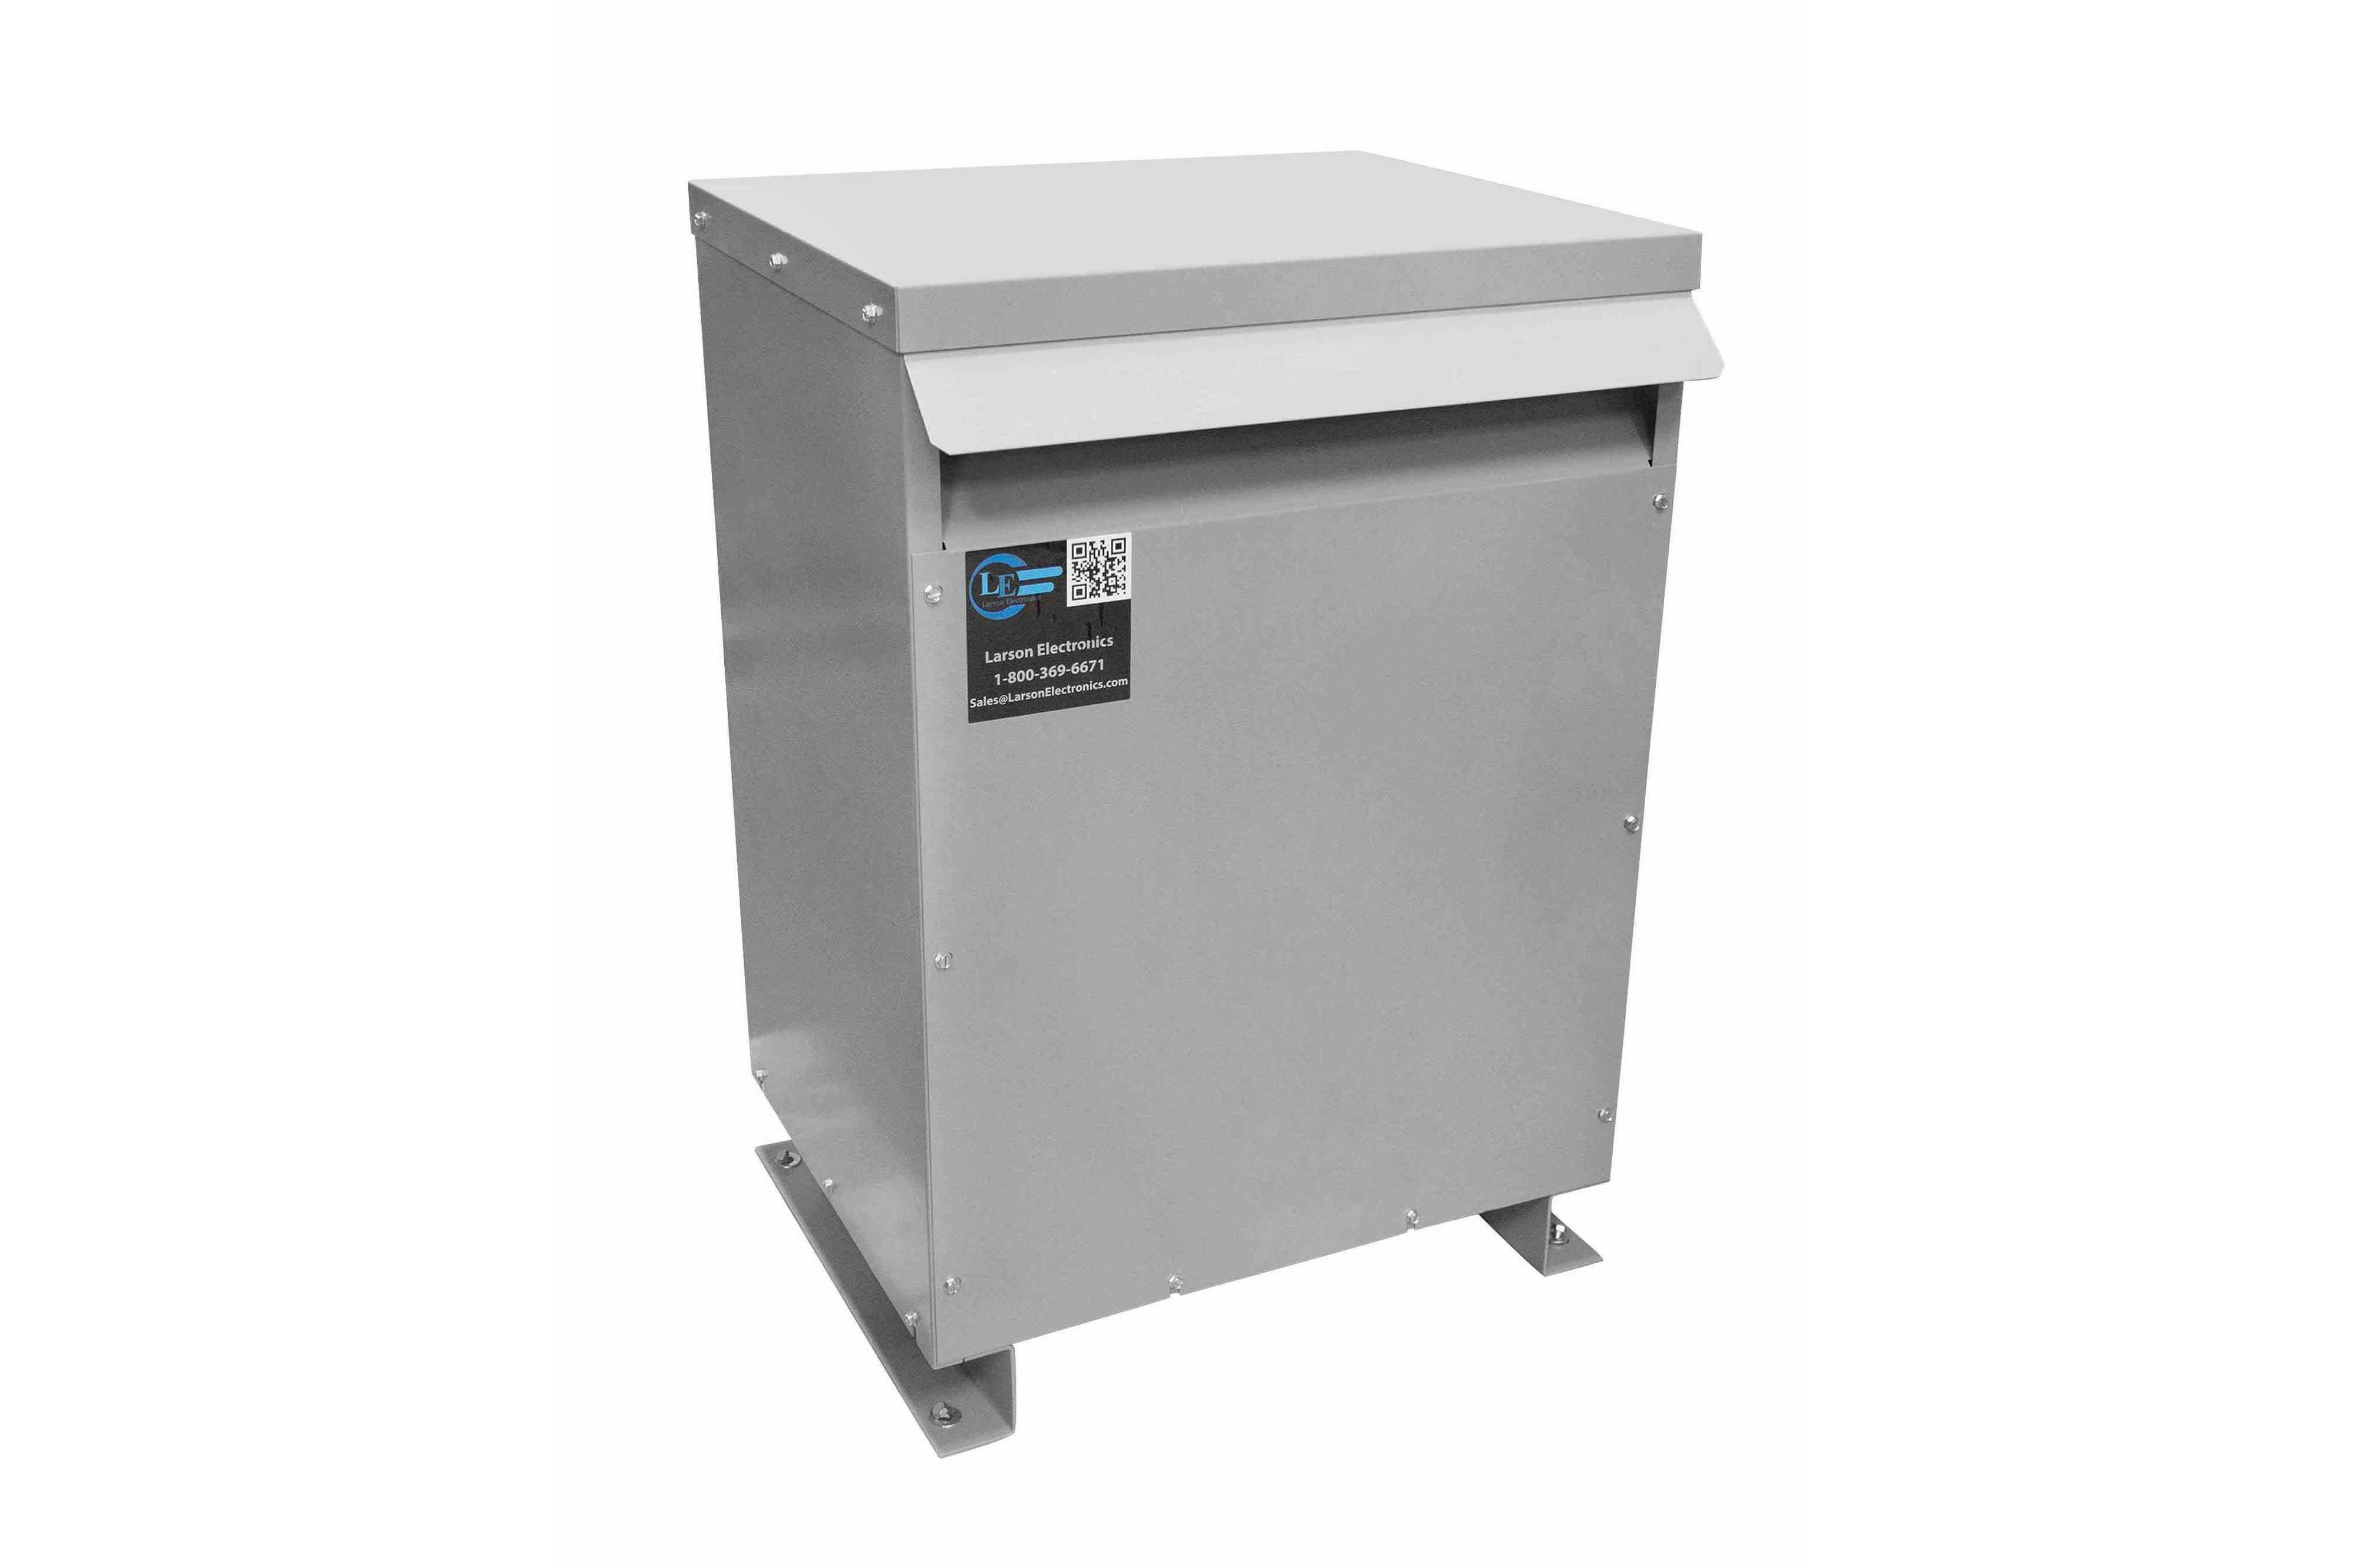 112.5 kVA 3PH DOE Transformer, 460V Delta Primary, 208Y/120 Wye-N Secondary, N3R, Ventilated, 60 Hz